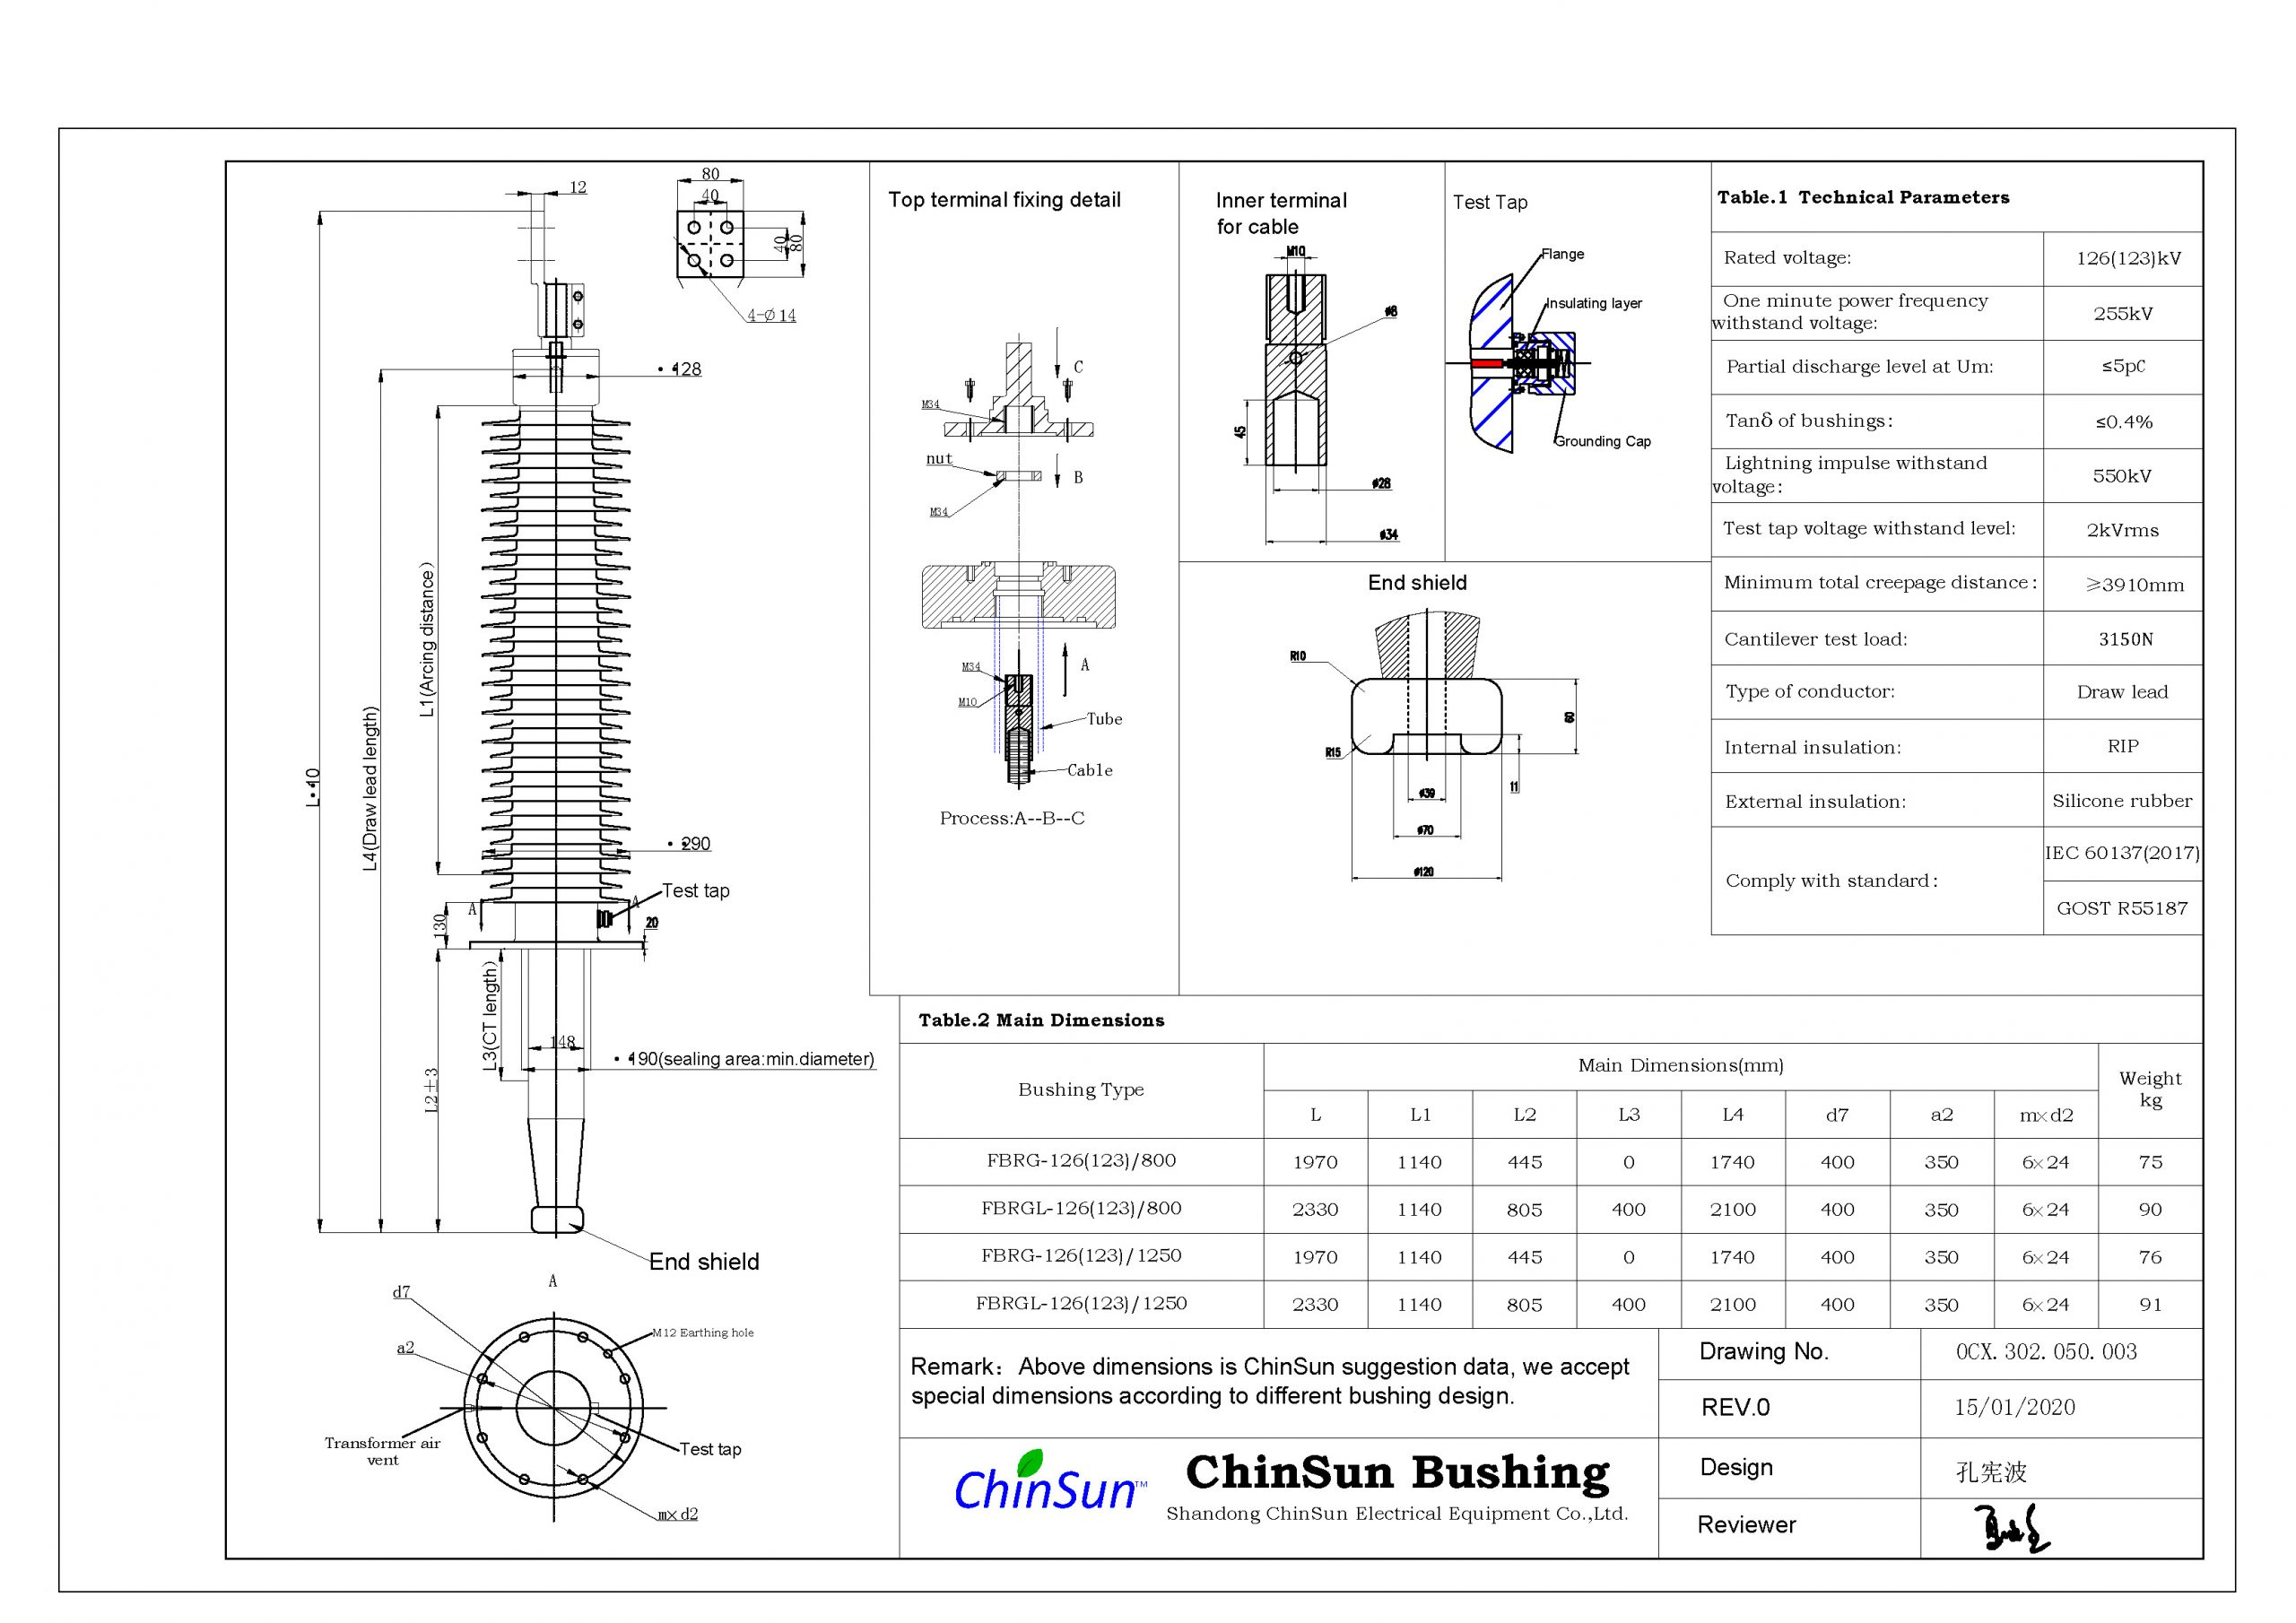 Drawing-transformer bushing-126(123)kV_silicone rubber-DL-ChinSun